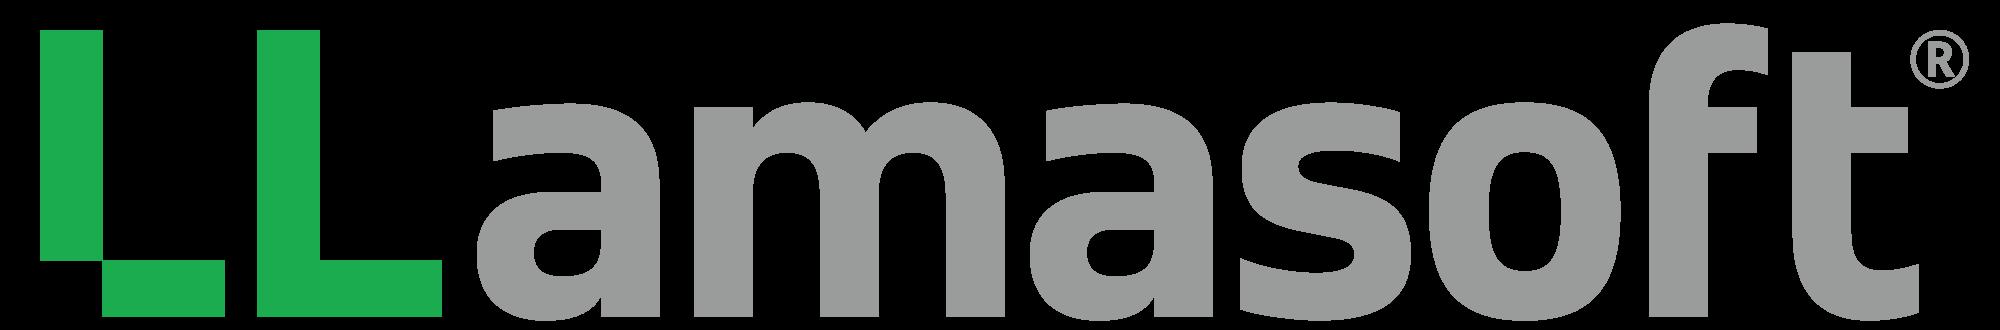 Llamasoft FinalLogo